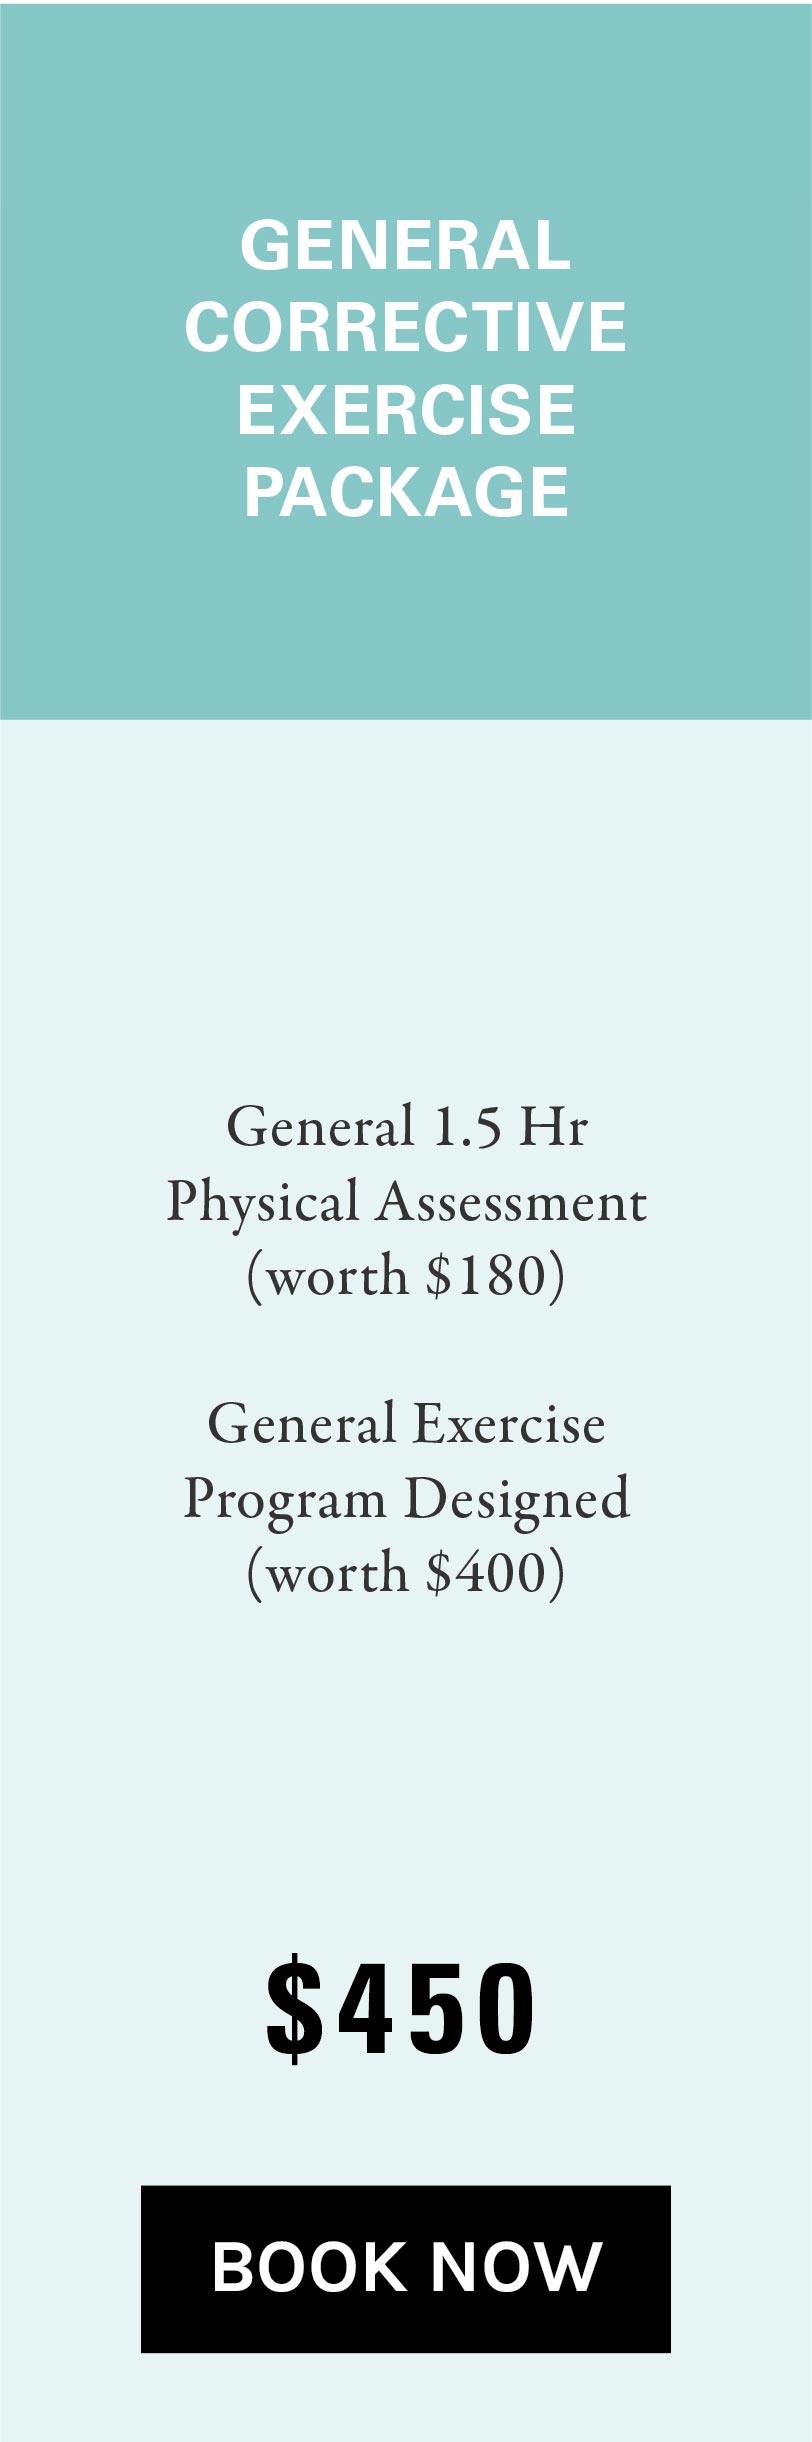 rhythm-health-package-graphic1-07.jpg